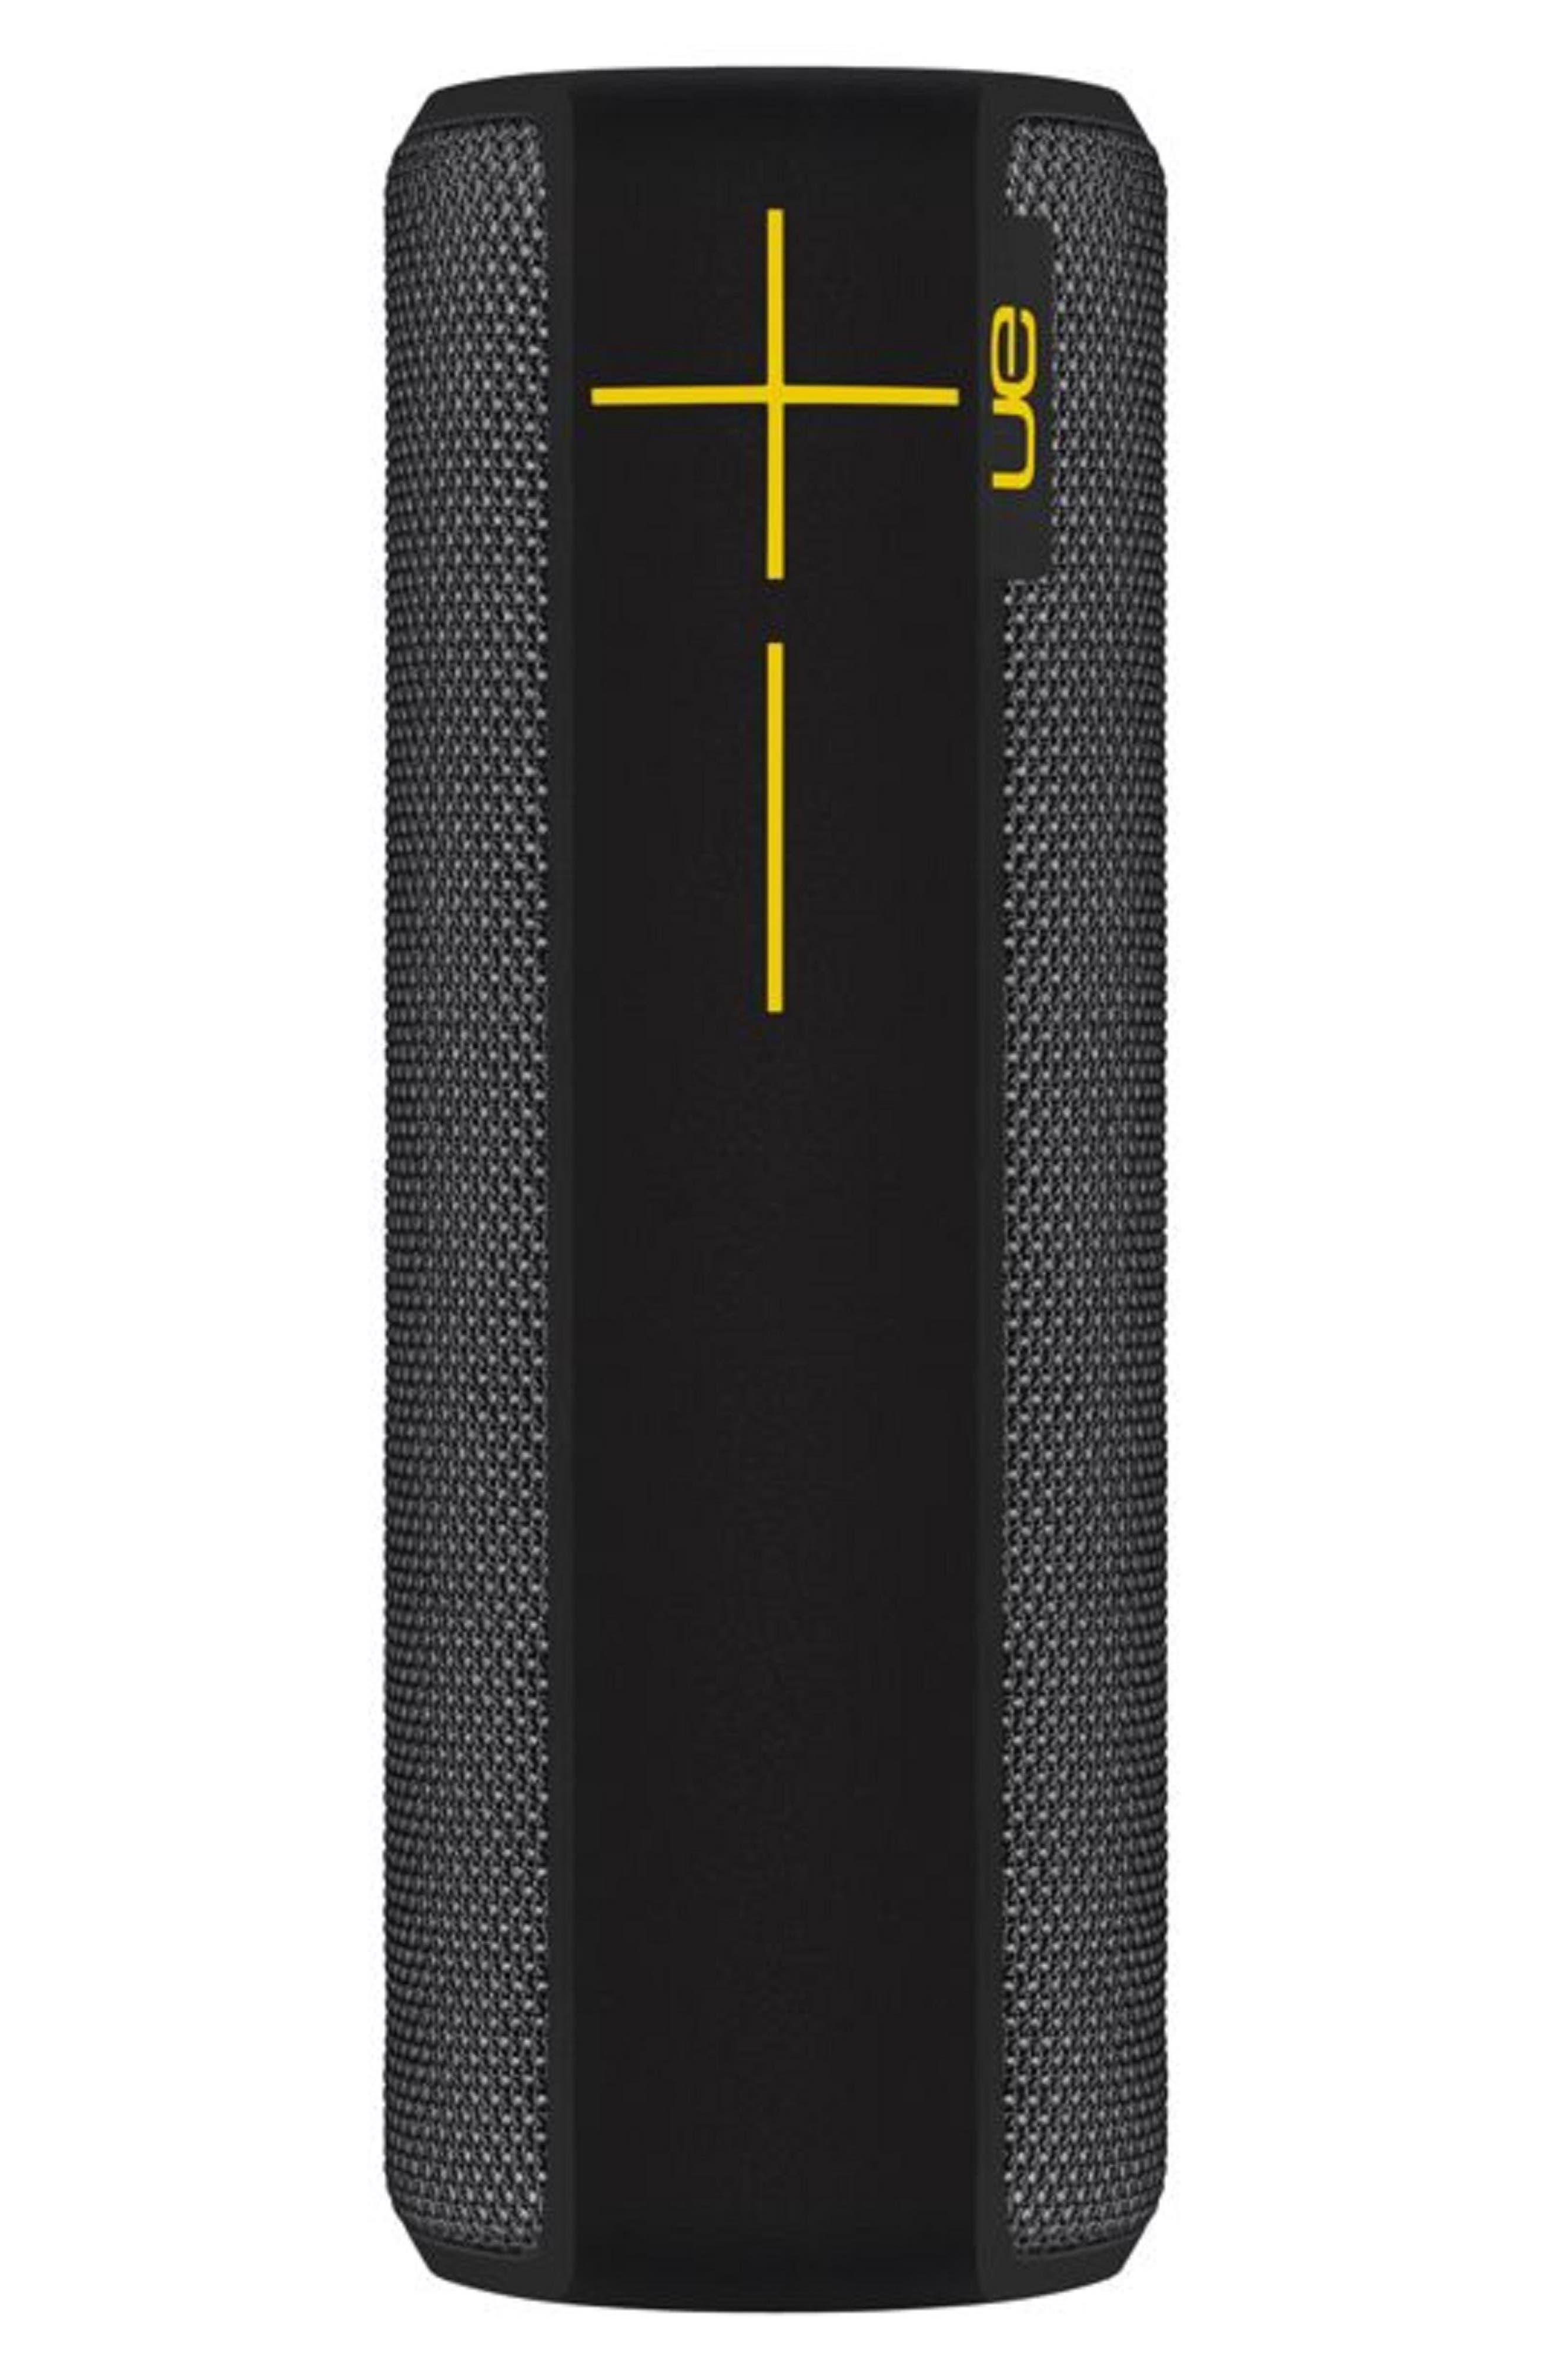 Alternate Image 1 Selected - UE Boom 2 Wireless Bluetooth® Speaker